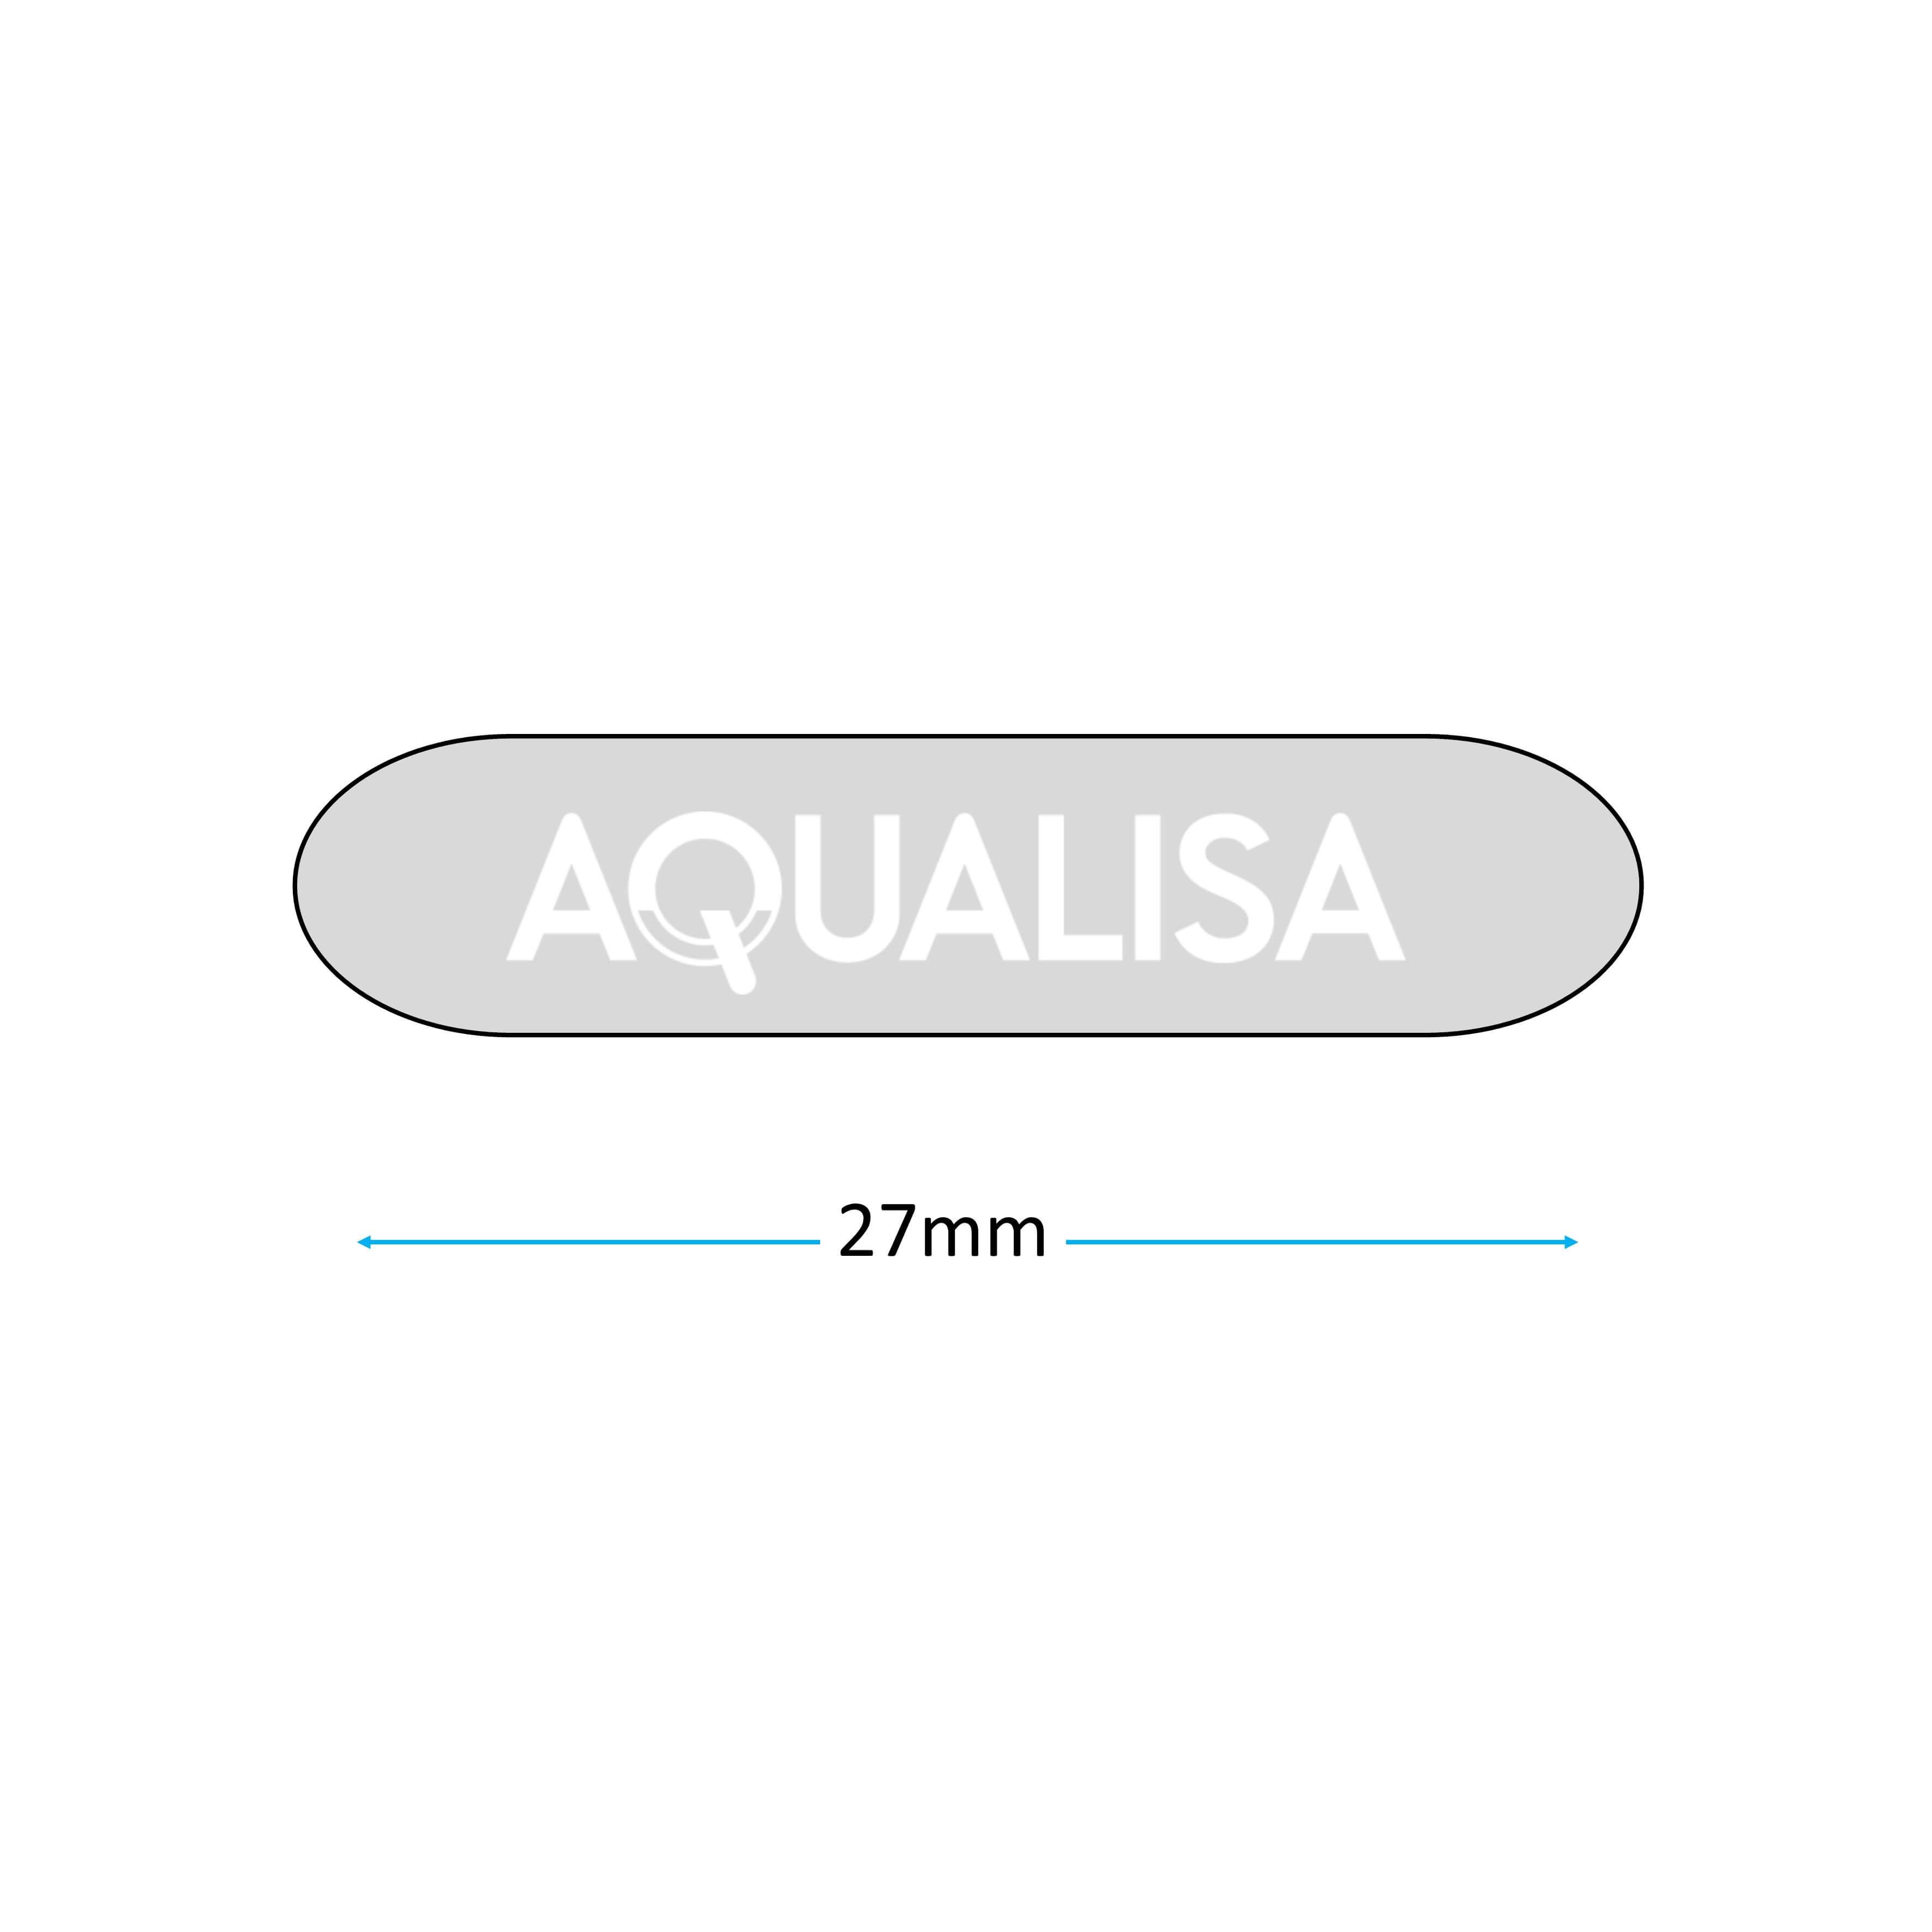 Aqualisa Badge 213024 measurements